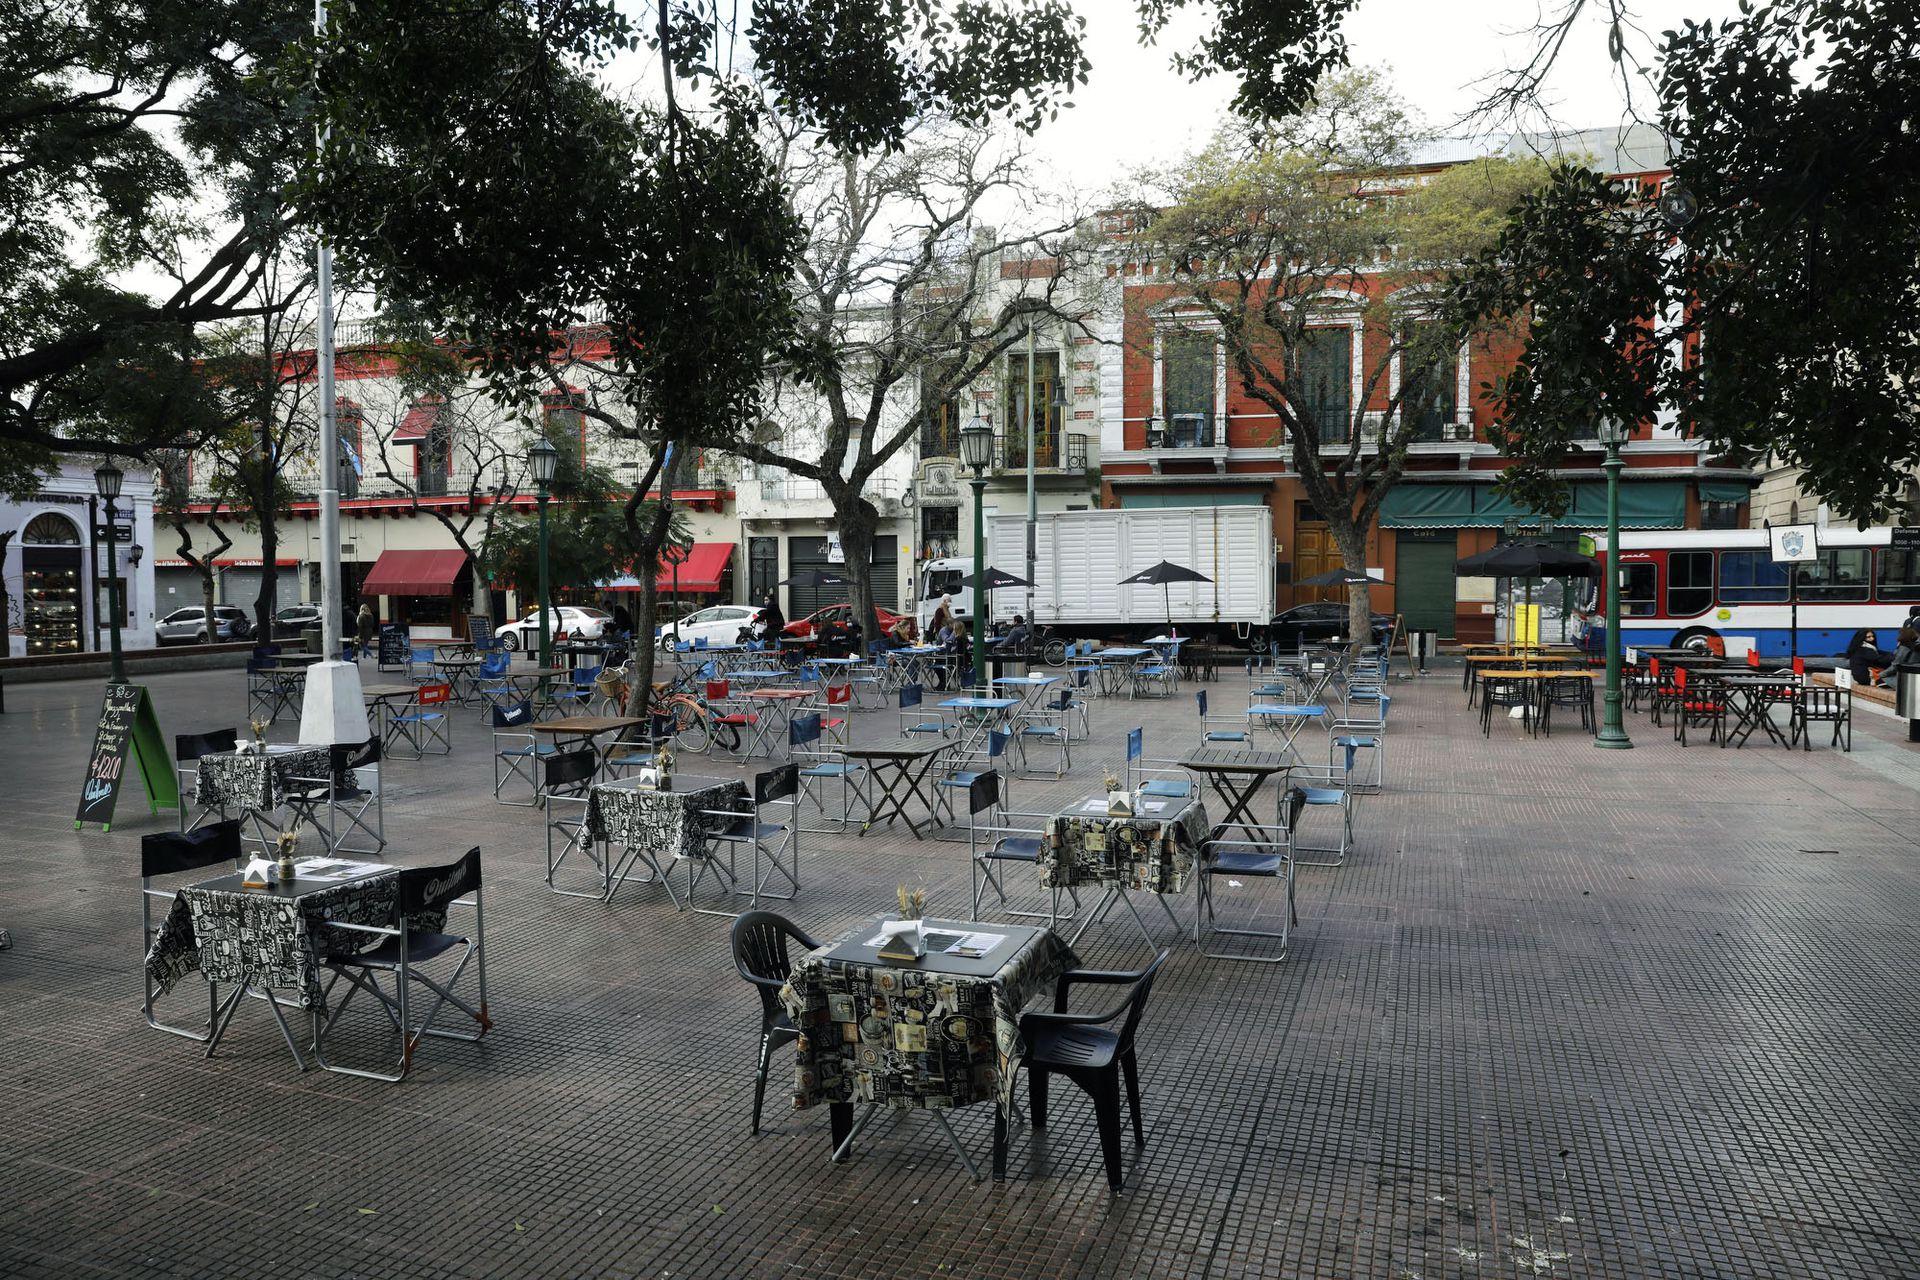 La Plaza Dorrego